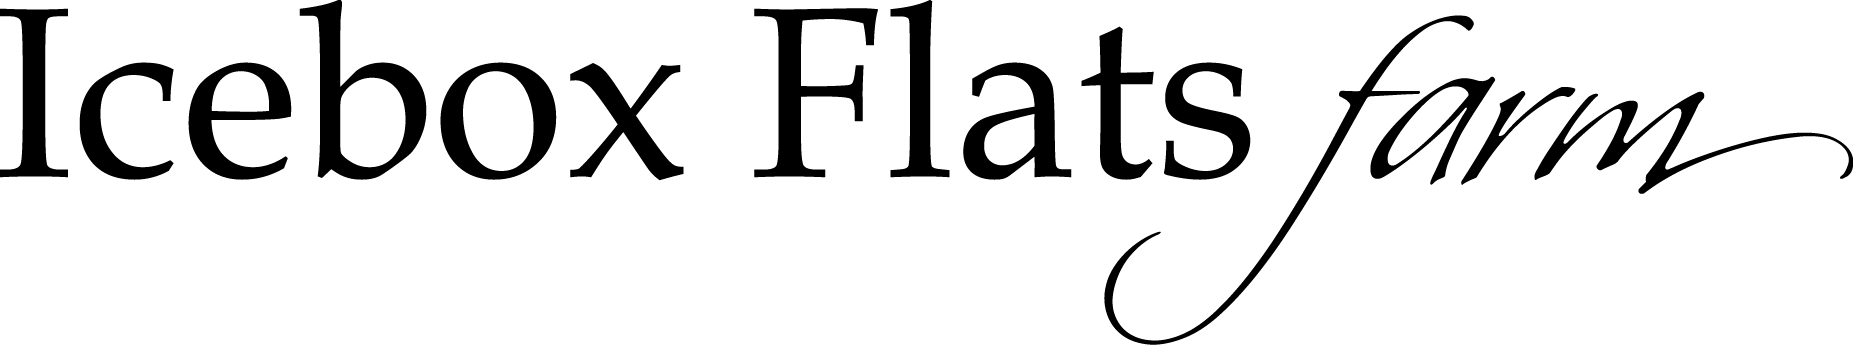 Icebox Flats Farm Logo